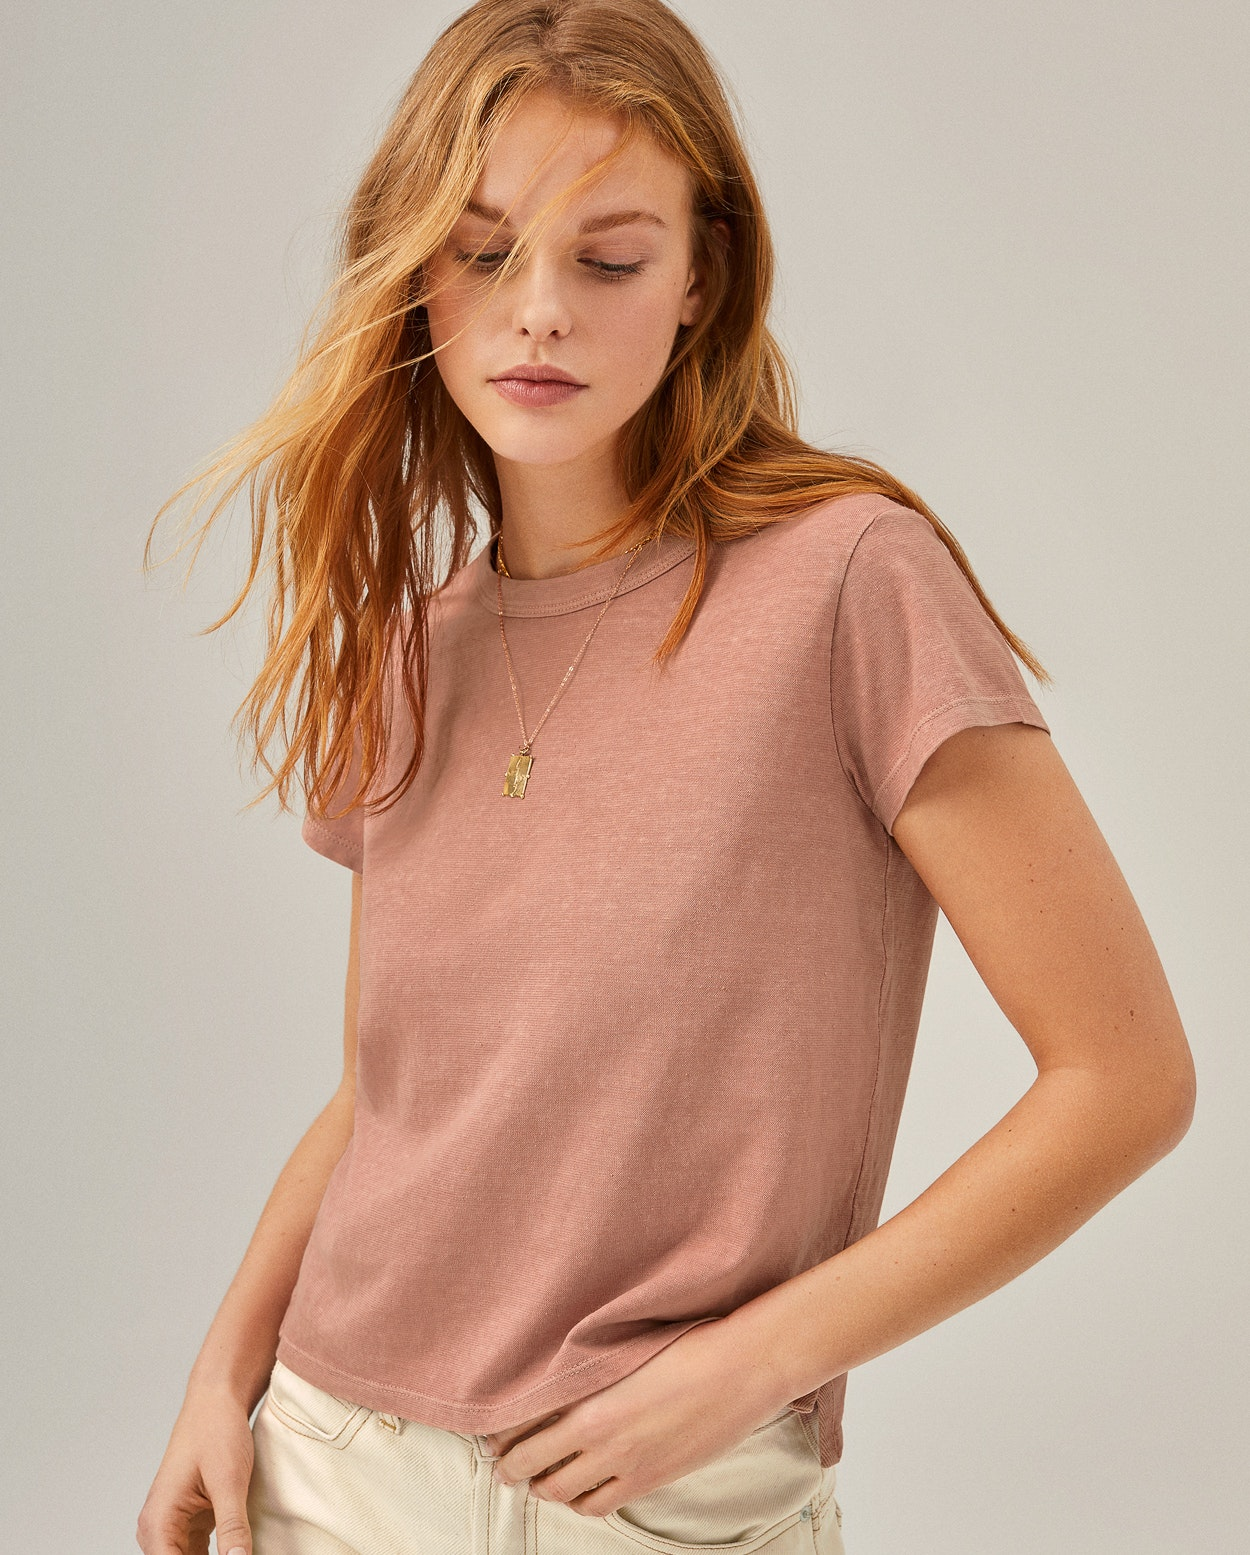 fcacf2b4fea7 Hemp cotton T-shirt - Wrap London